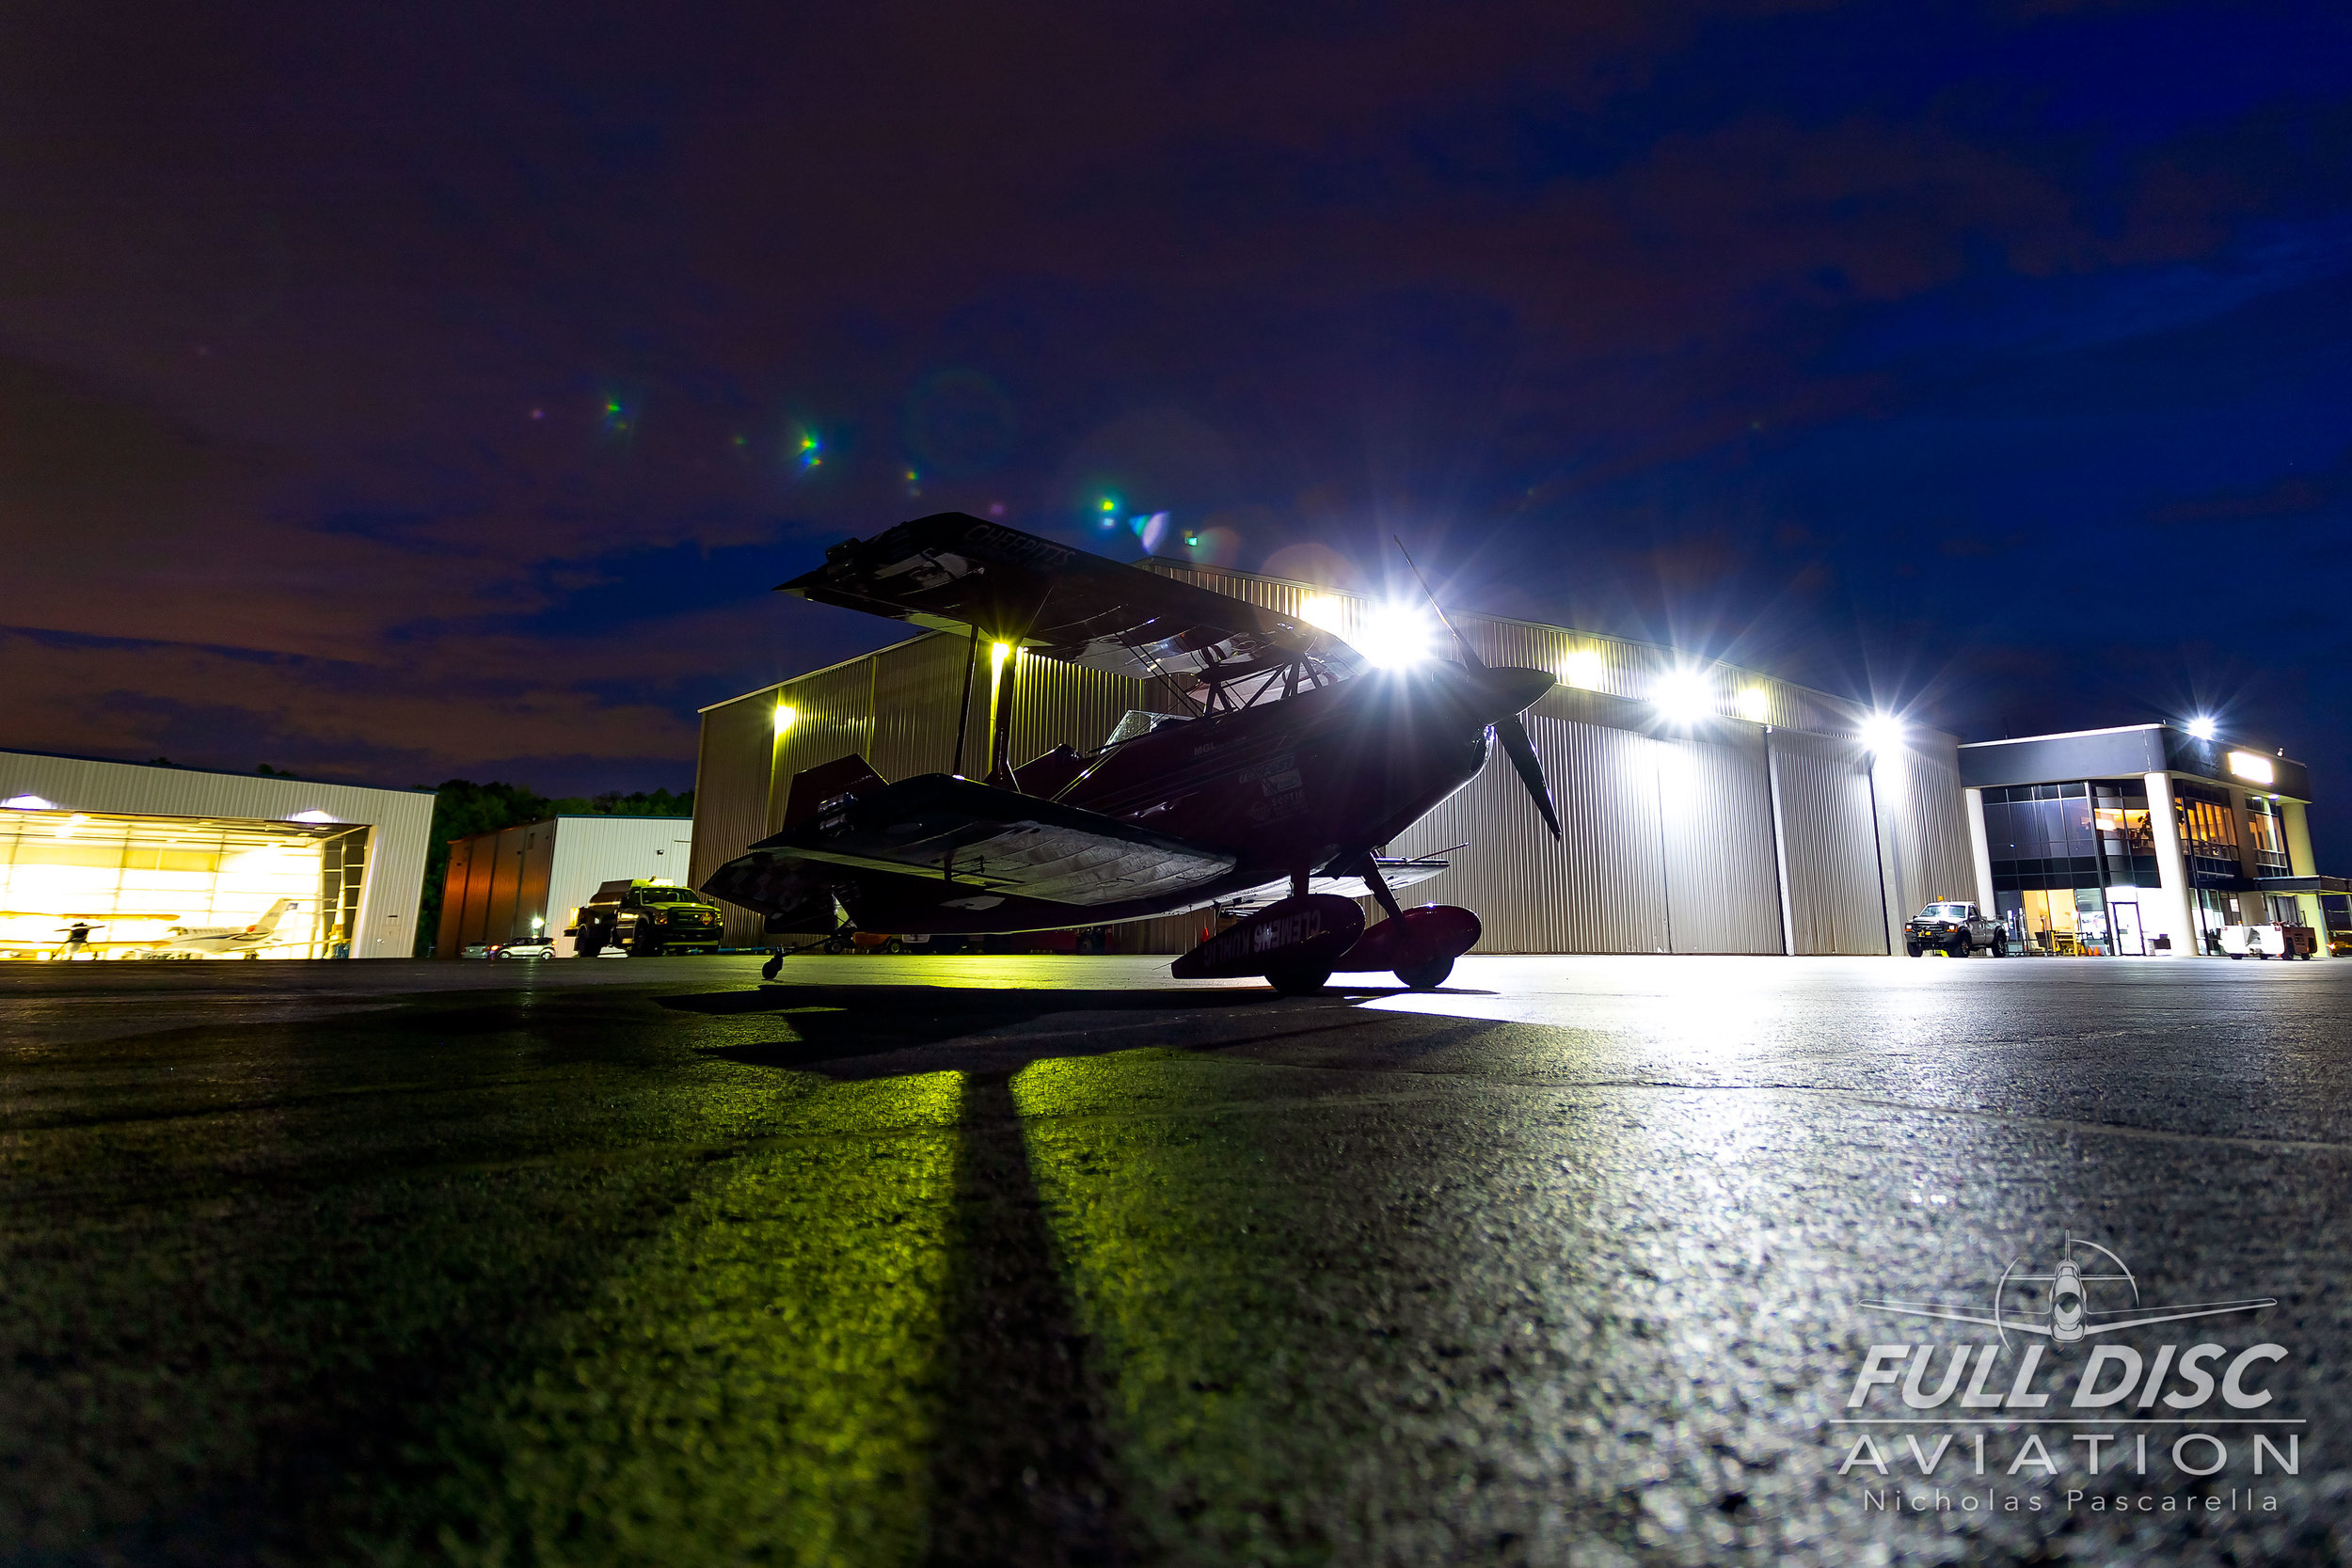 chefpitts_silhouette_nickpascarella_nicholaspascarella_fulldiscaviation_aviation_.jpg